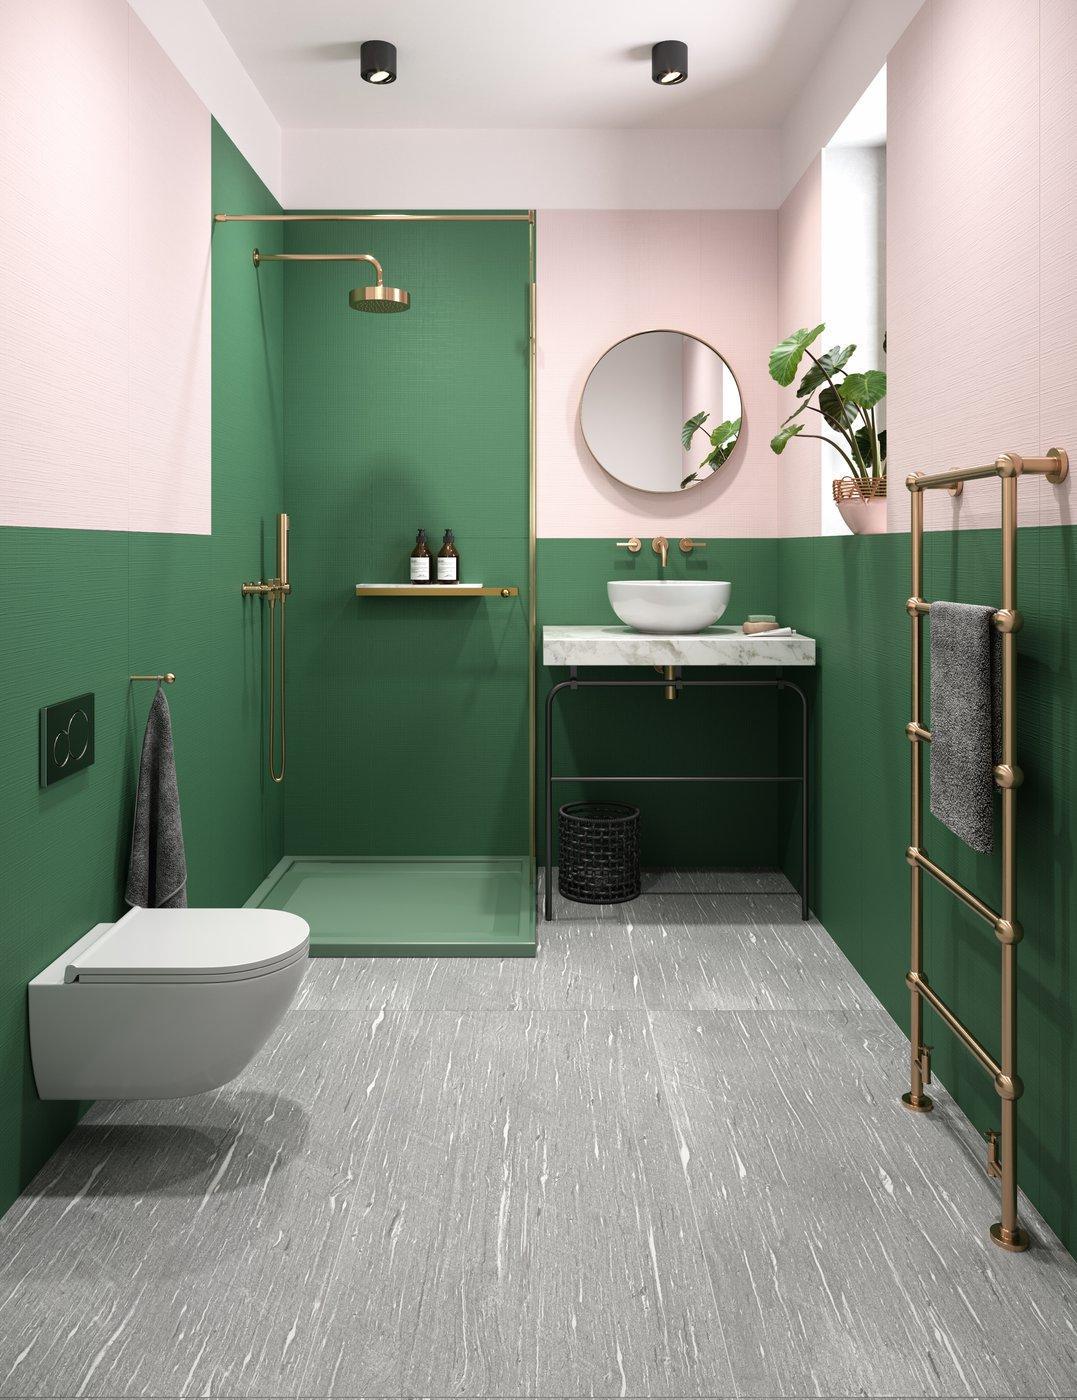 Zelená v kúpeľni - Obrázok č. 19